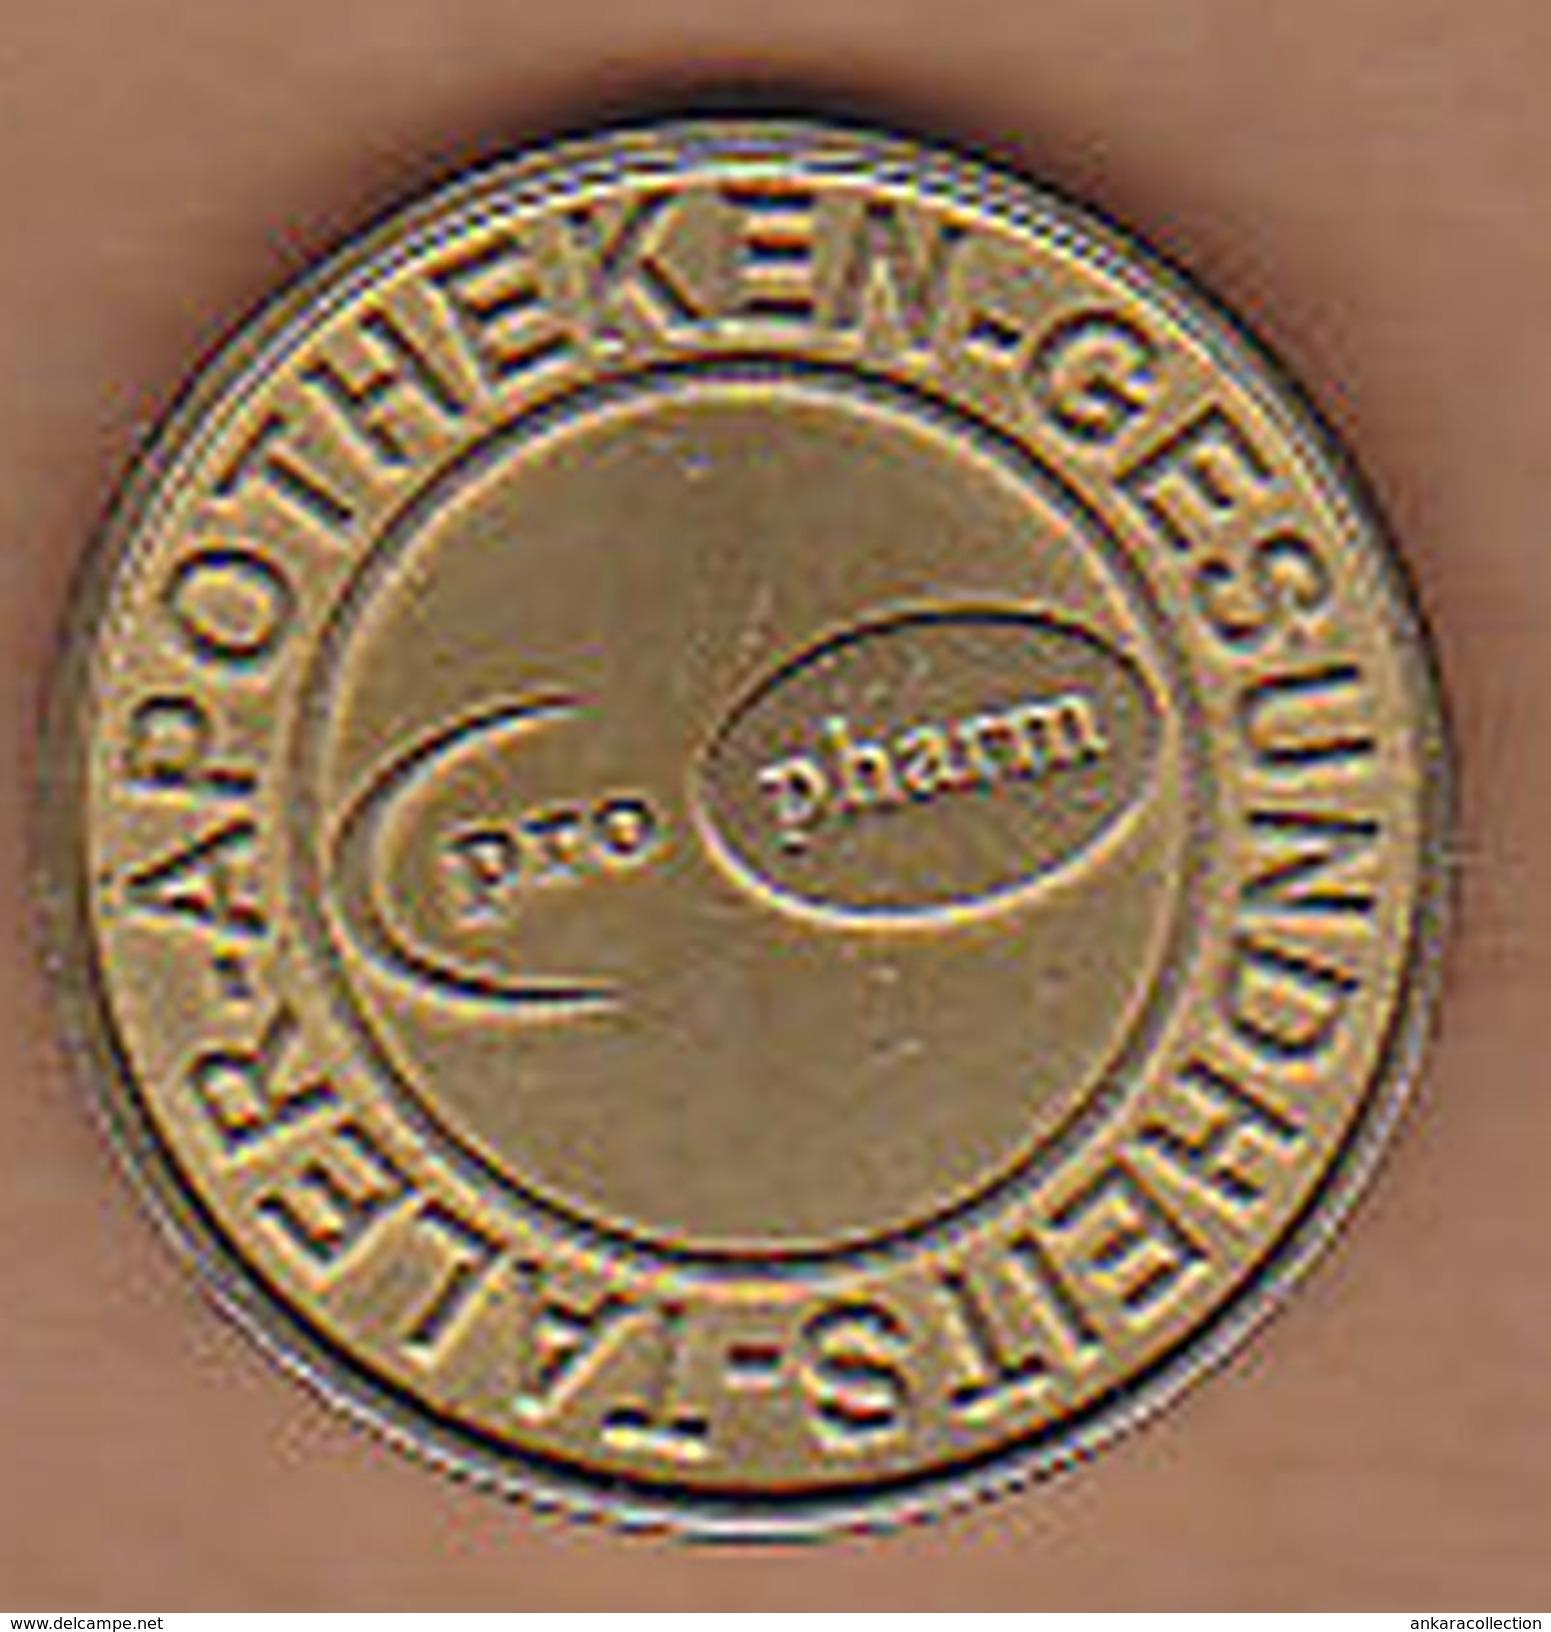 AC -  GESUNDHEITS TALER APOTHEKEN SANDOZ PRO PHARM PHARMACY TOKEN JETON - Monetary/Of Necessity